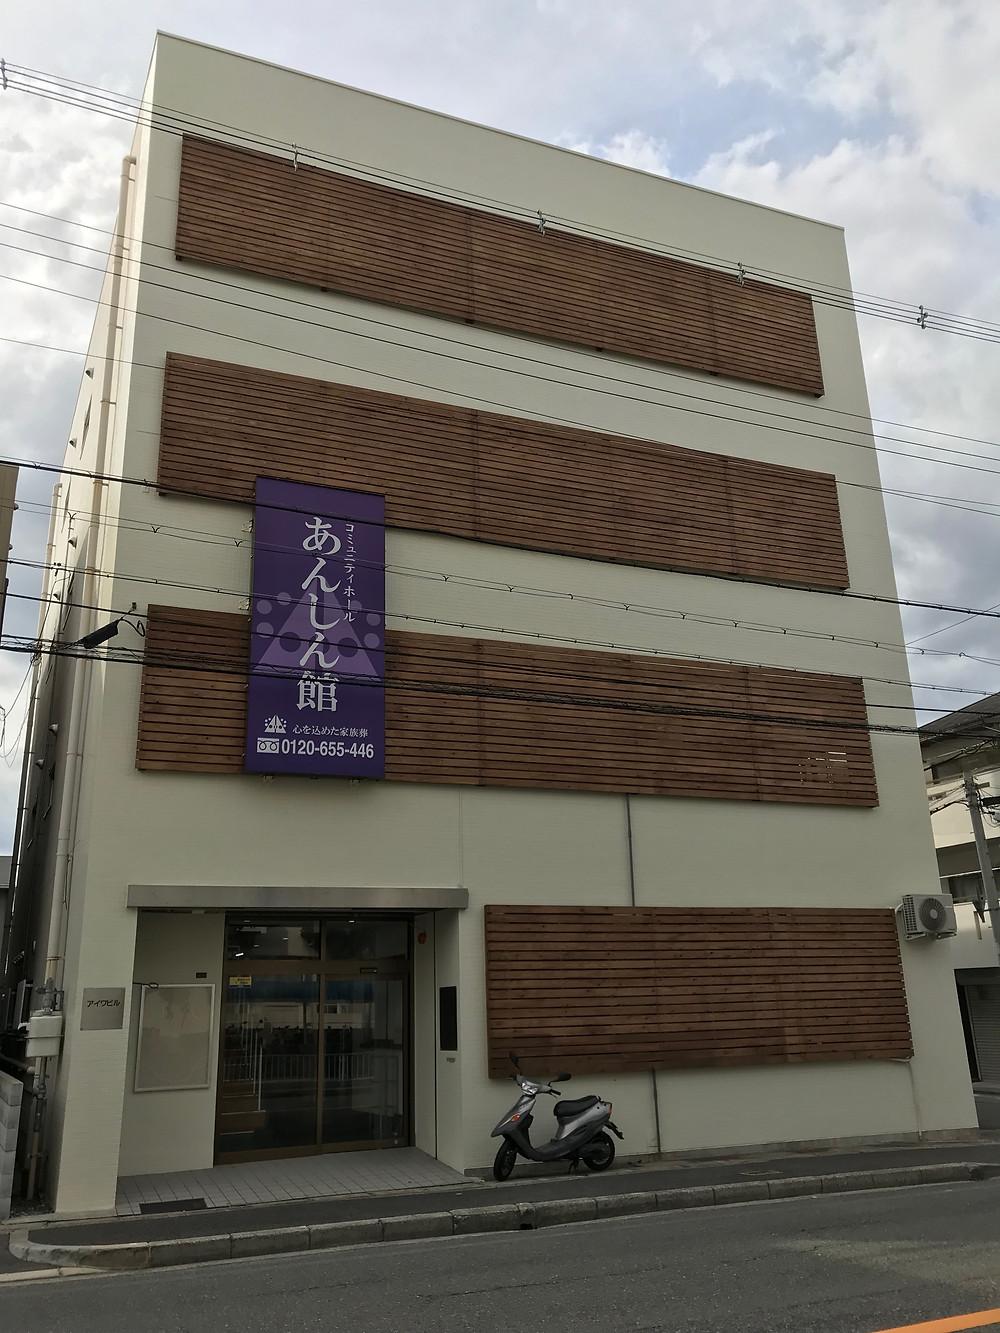 尼崎市七松町3-16-11、あんしん館、尼崎市役所前、家族葬、火葬、一日葬、生活保護